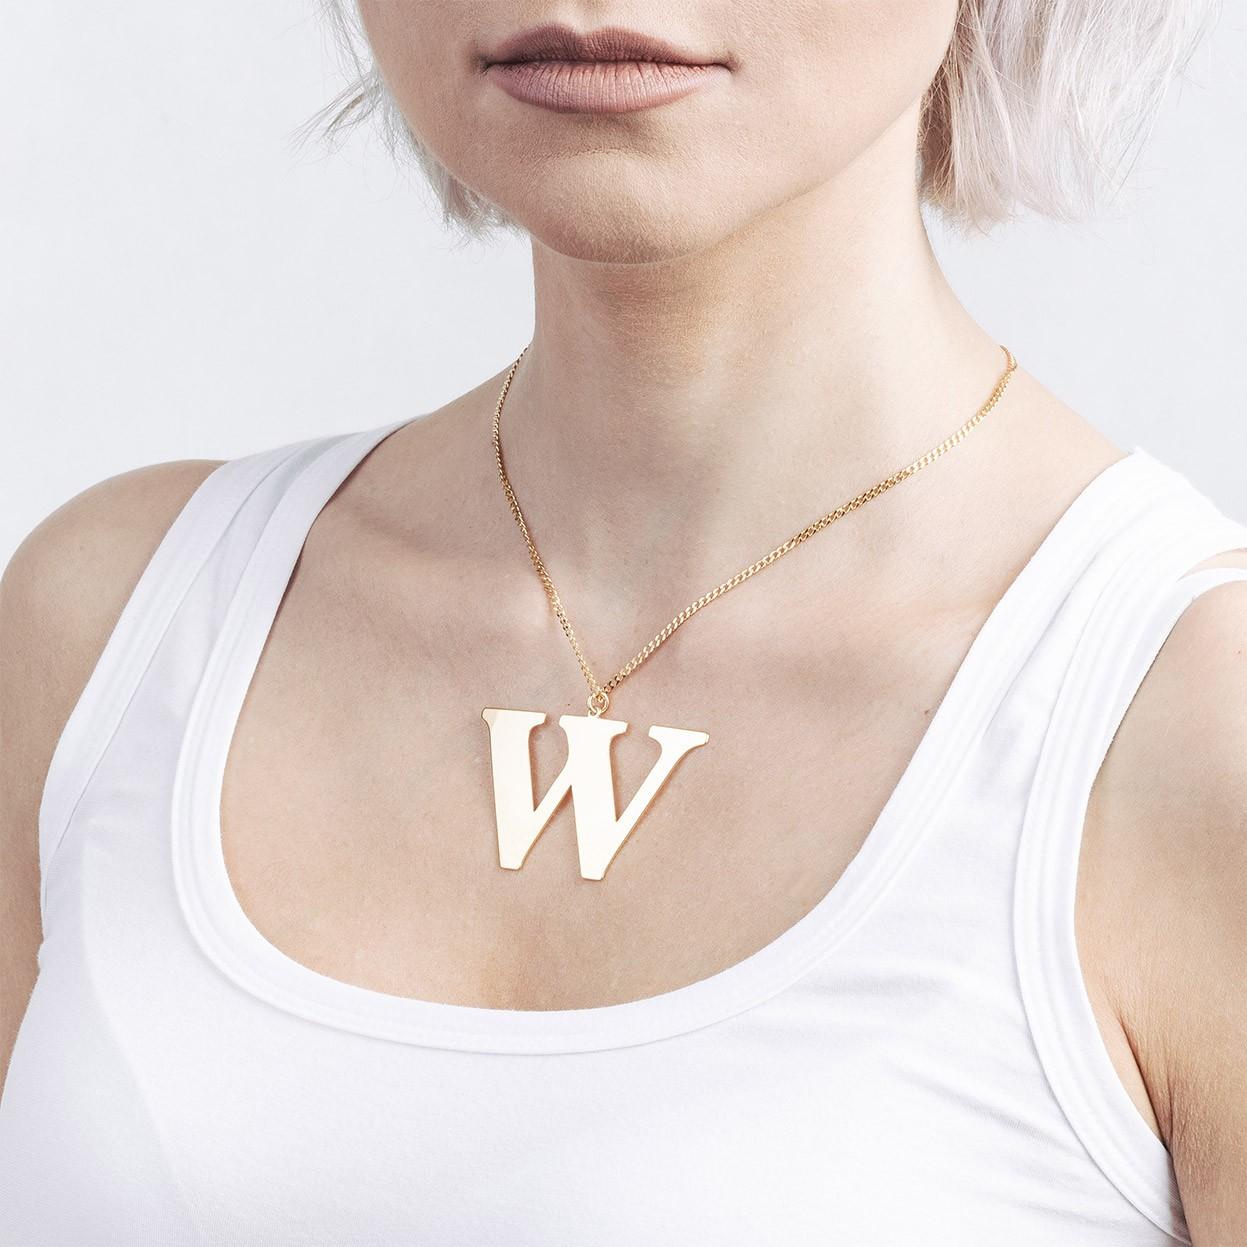 Srebrny naszyjnik dowolna litera 5 cm, alfabet, srebro 925